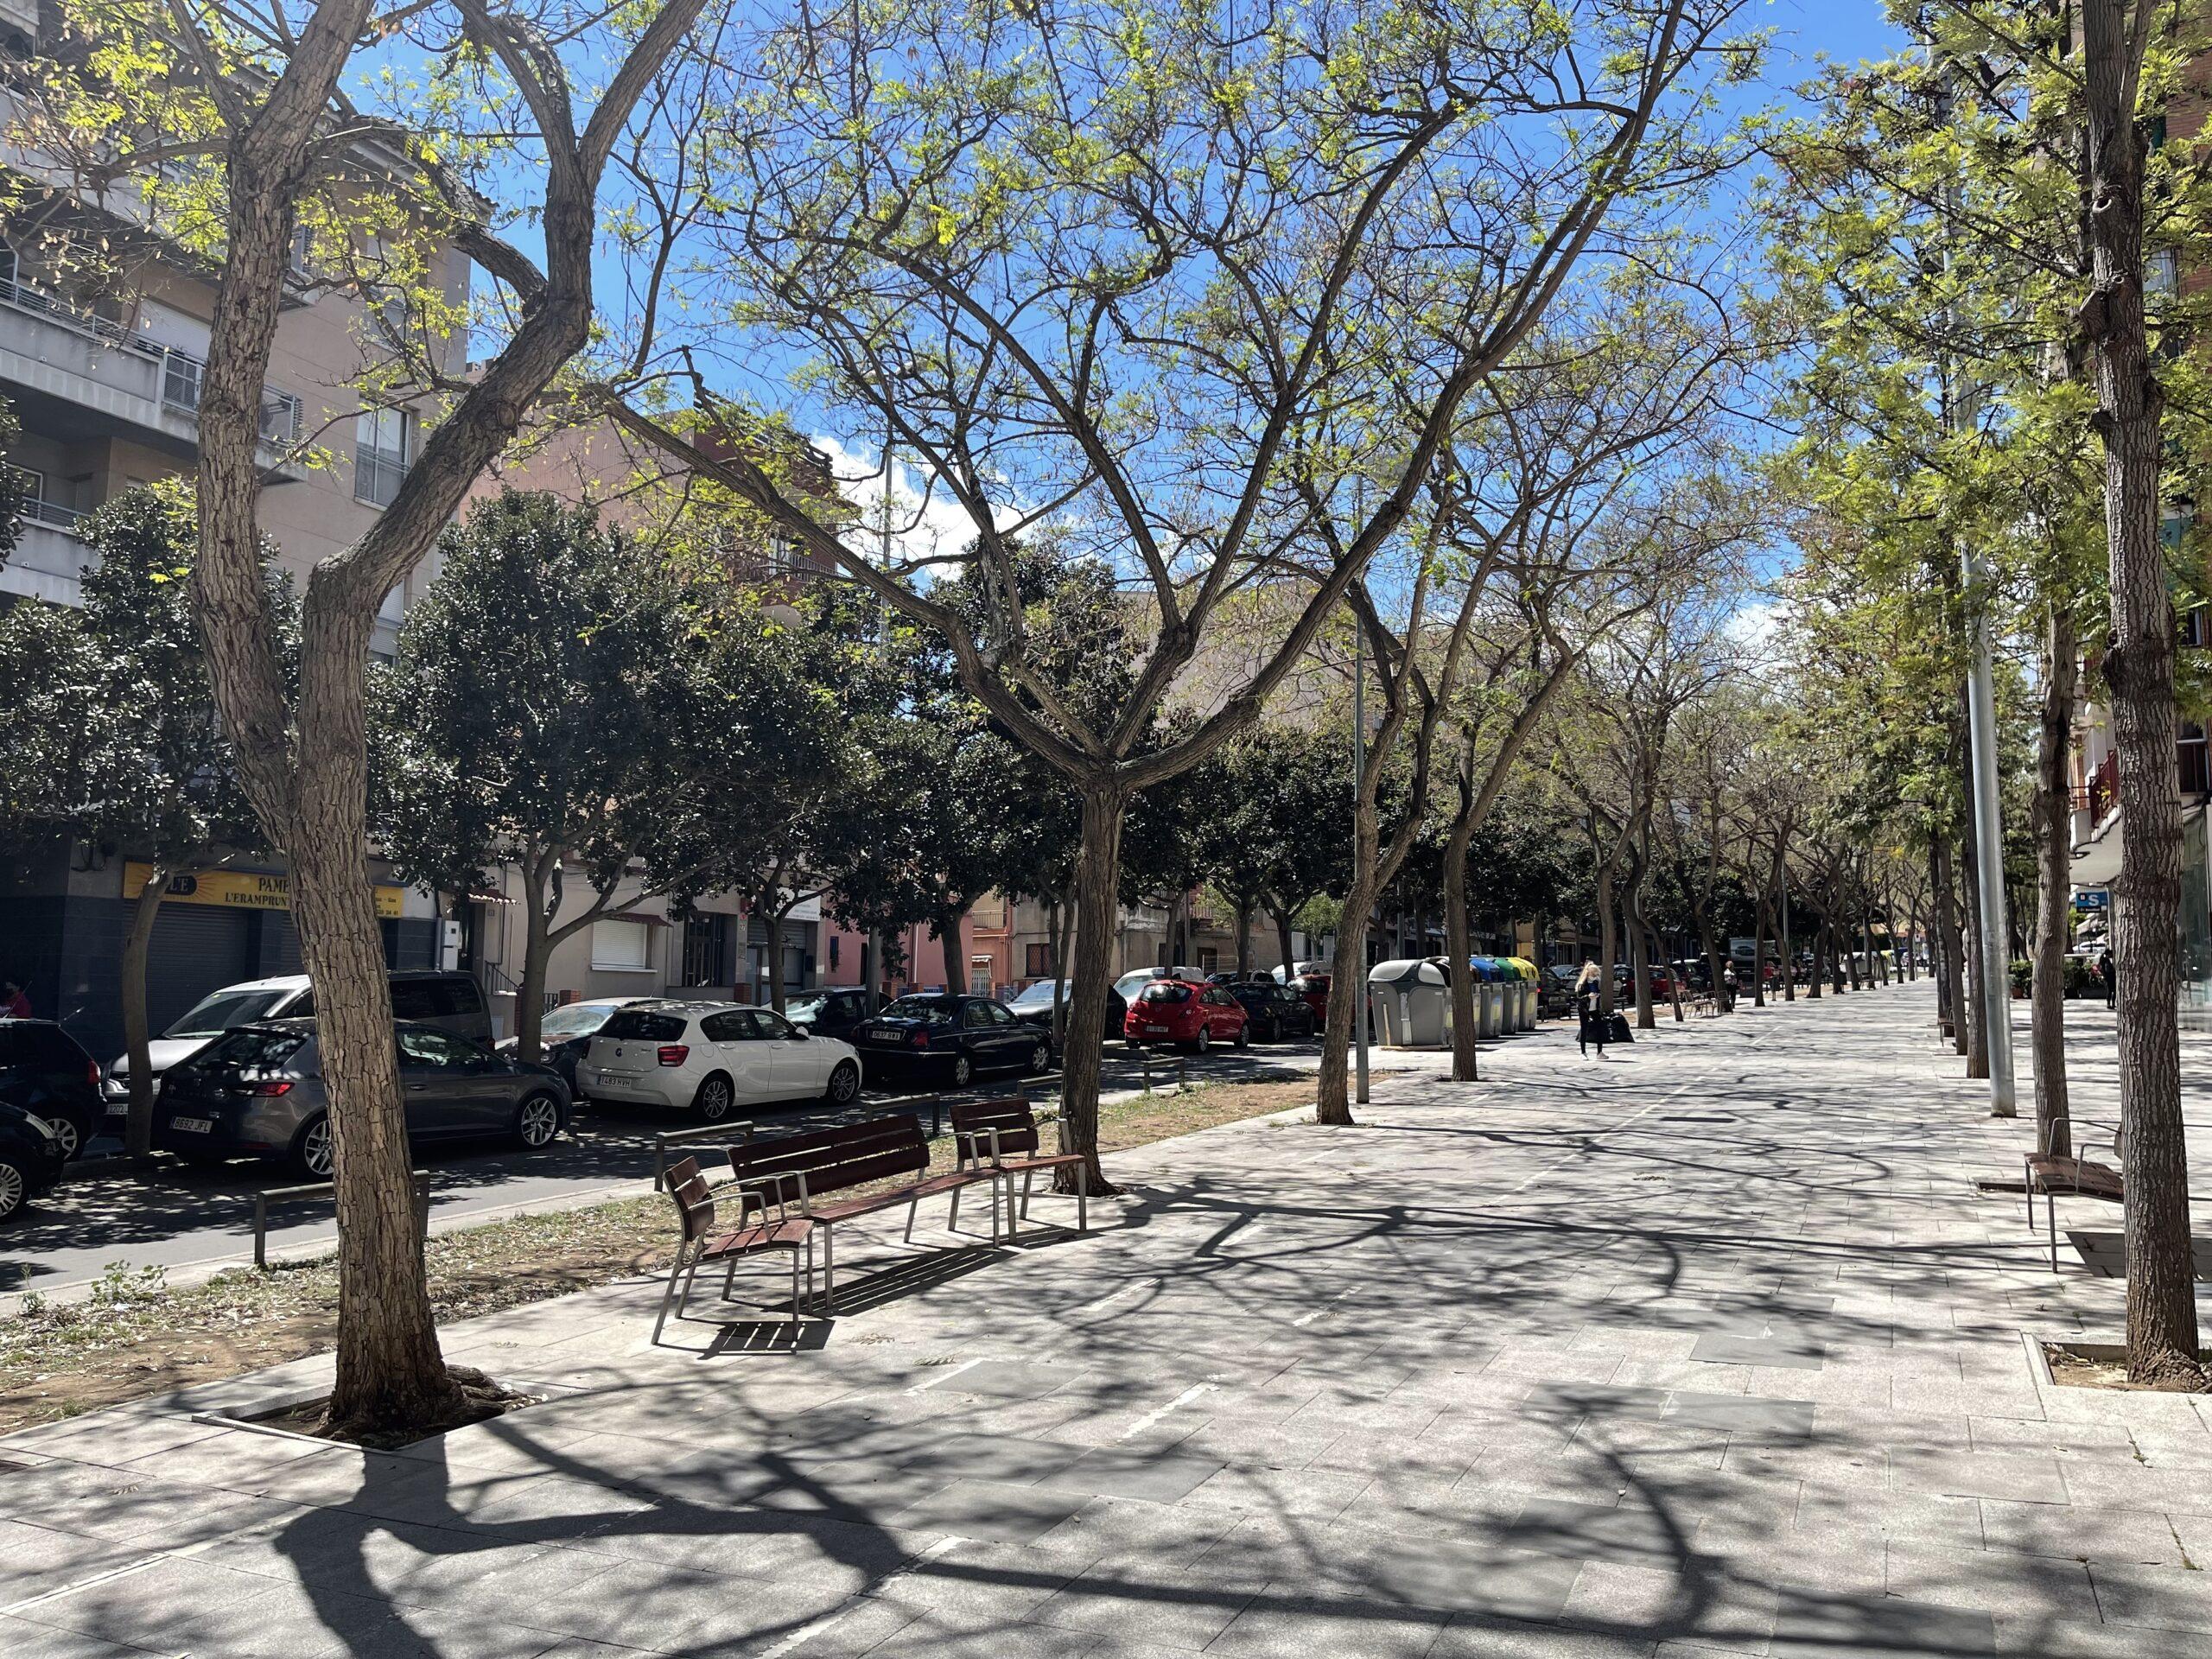 Avenida Eramprunyà.